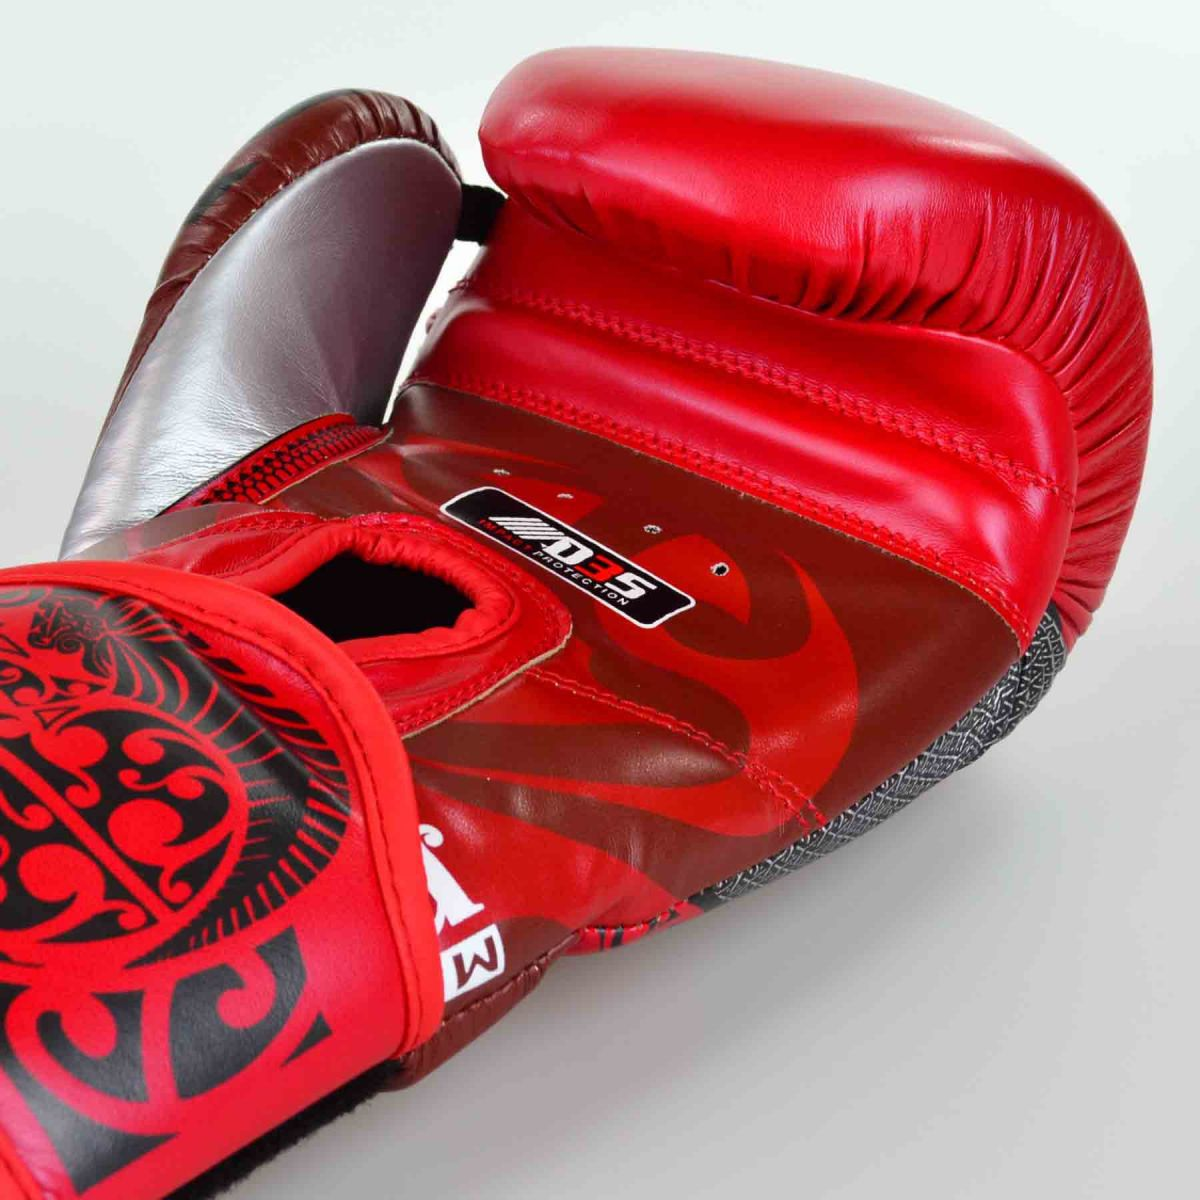 Luvas Boxe / Muay Thai - Maori - Best Defense - Vermelho - 10/12/14OZ .  - Loja do Competidor